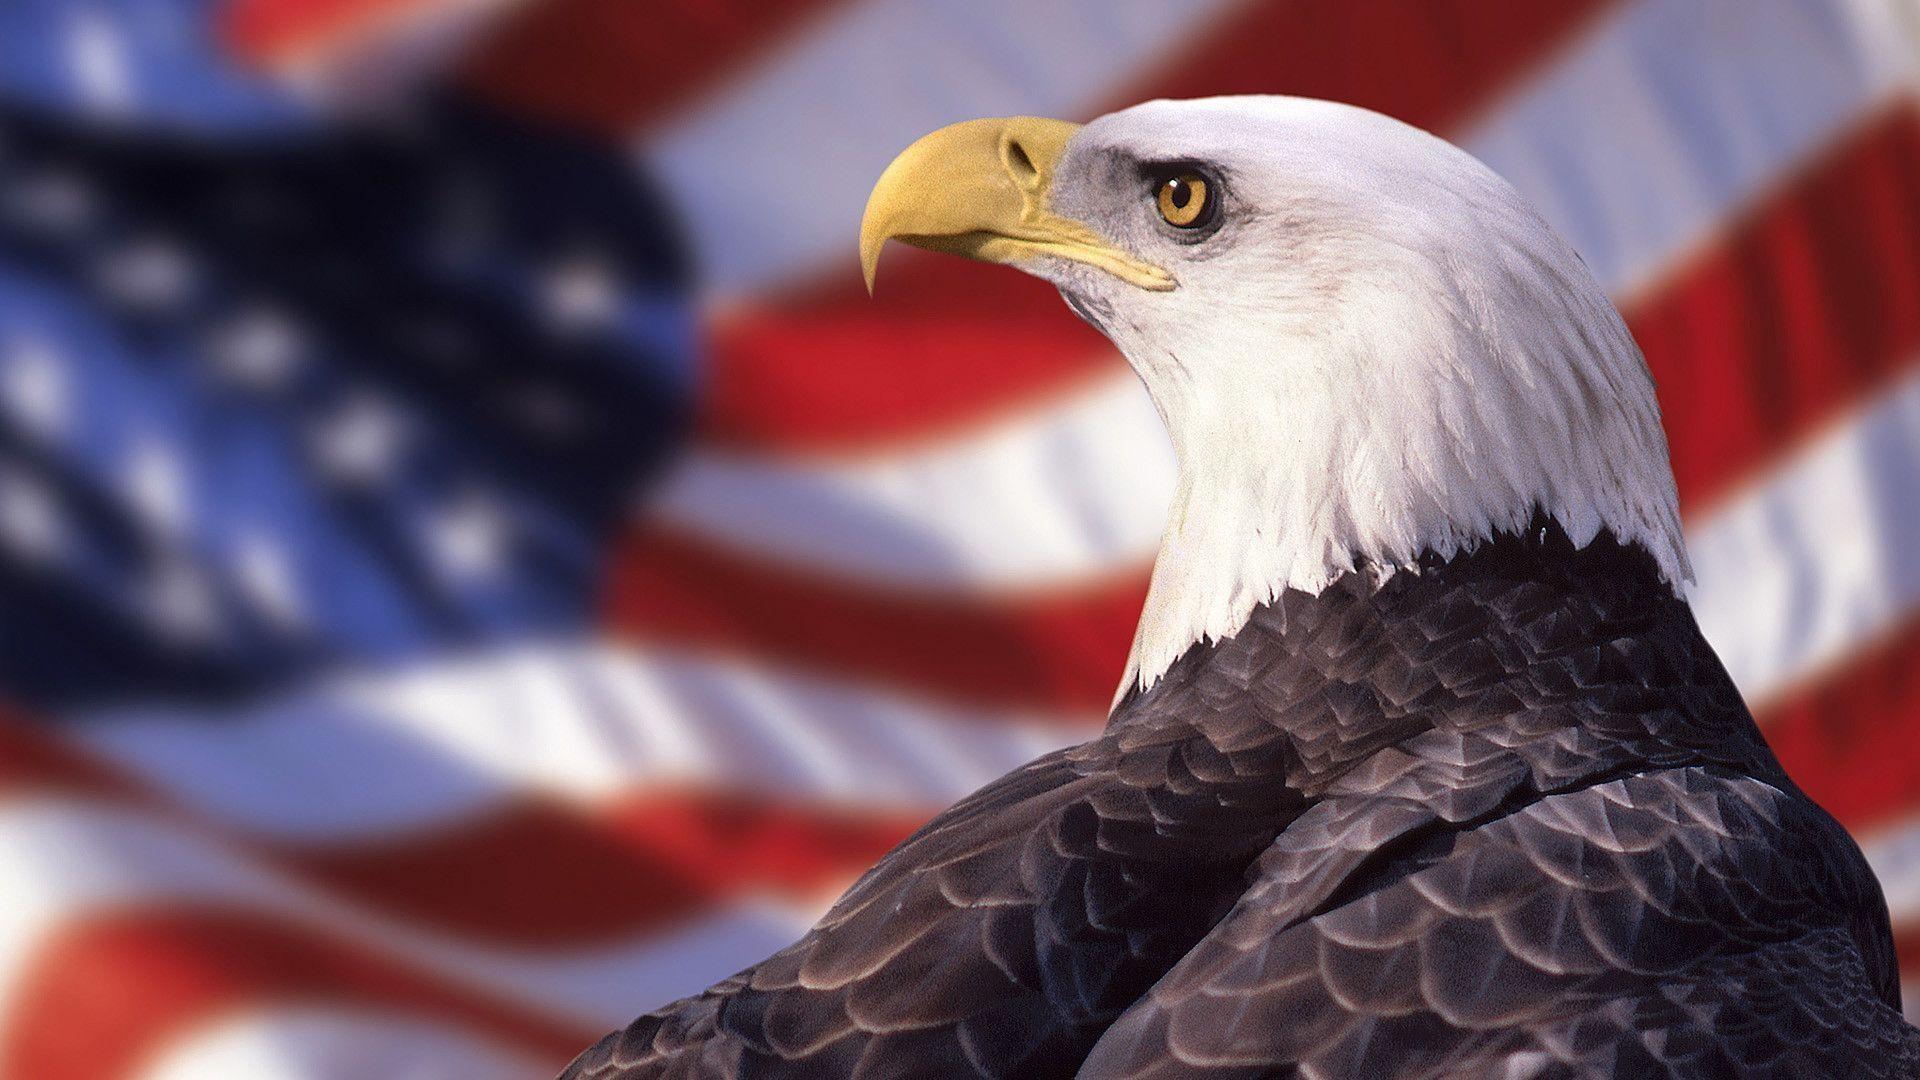 Bald Eagle American Flag Wallpaper | Best Free Wallpaper